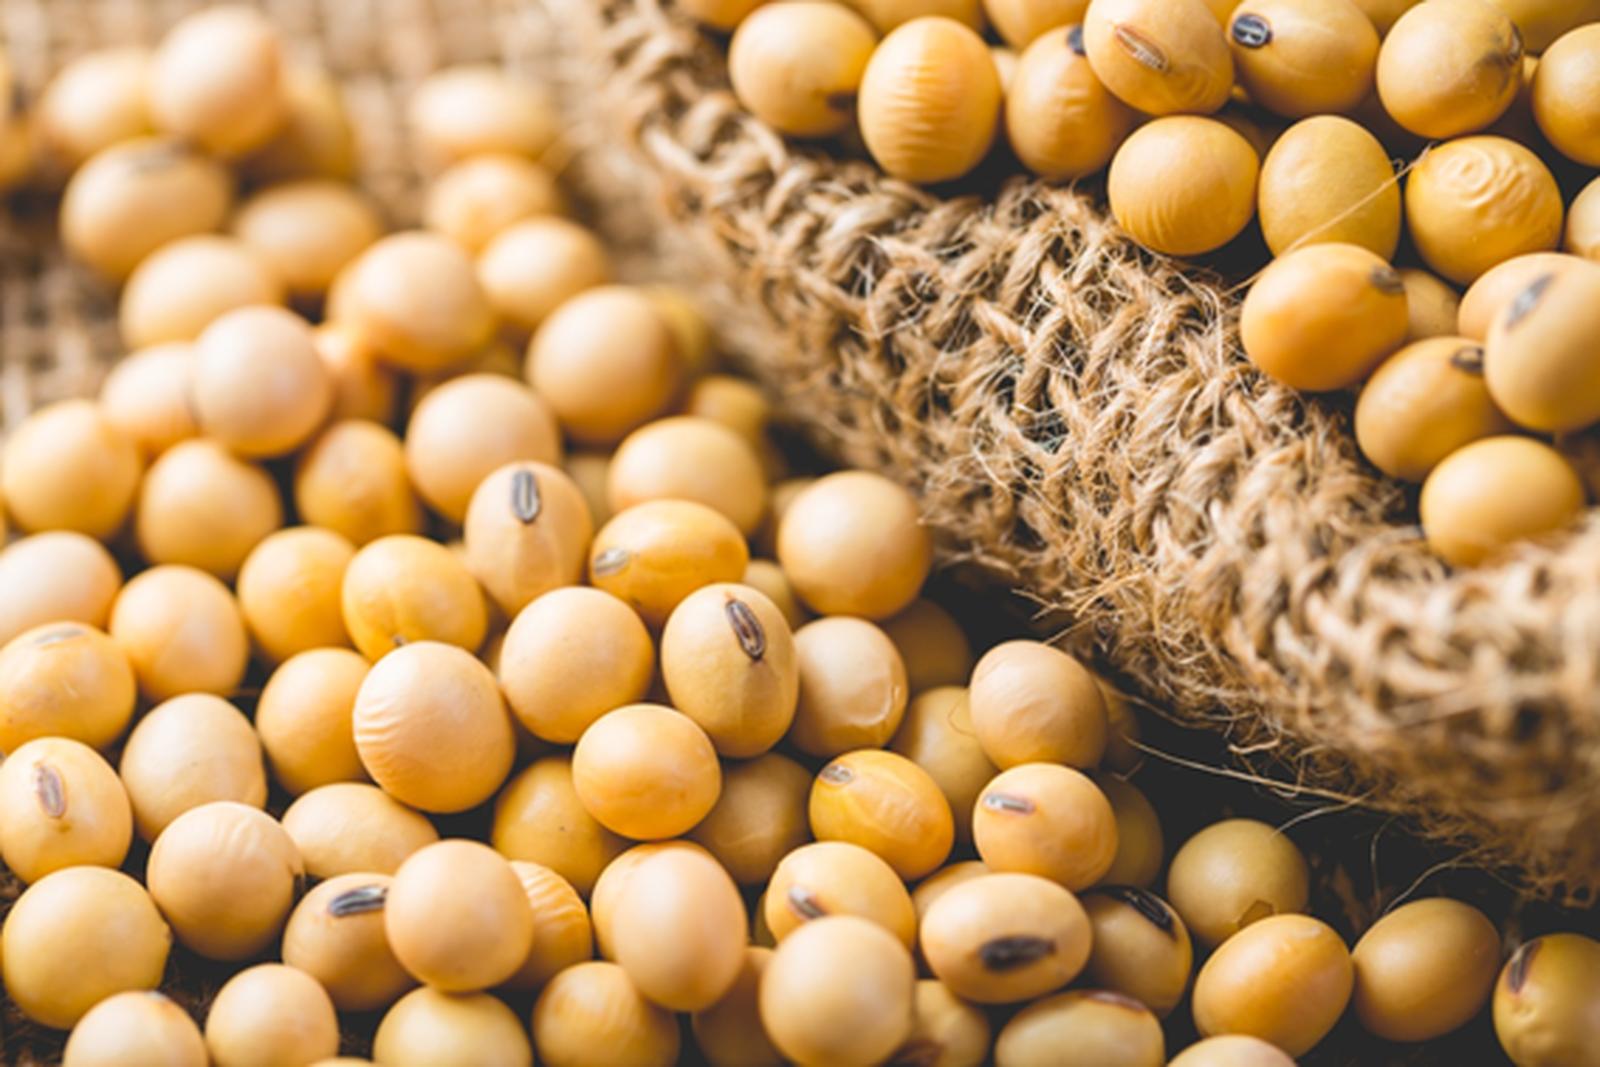 França vai produzir leguminosas para reduzir dependência da soja brasileira